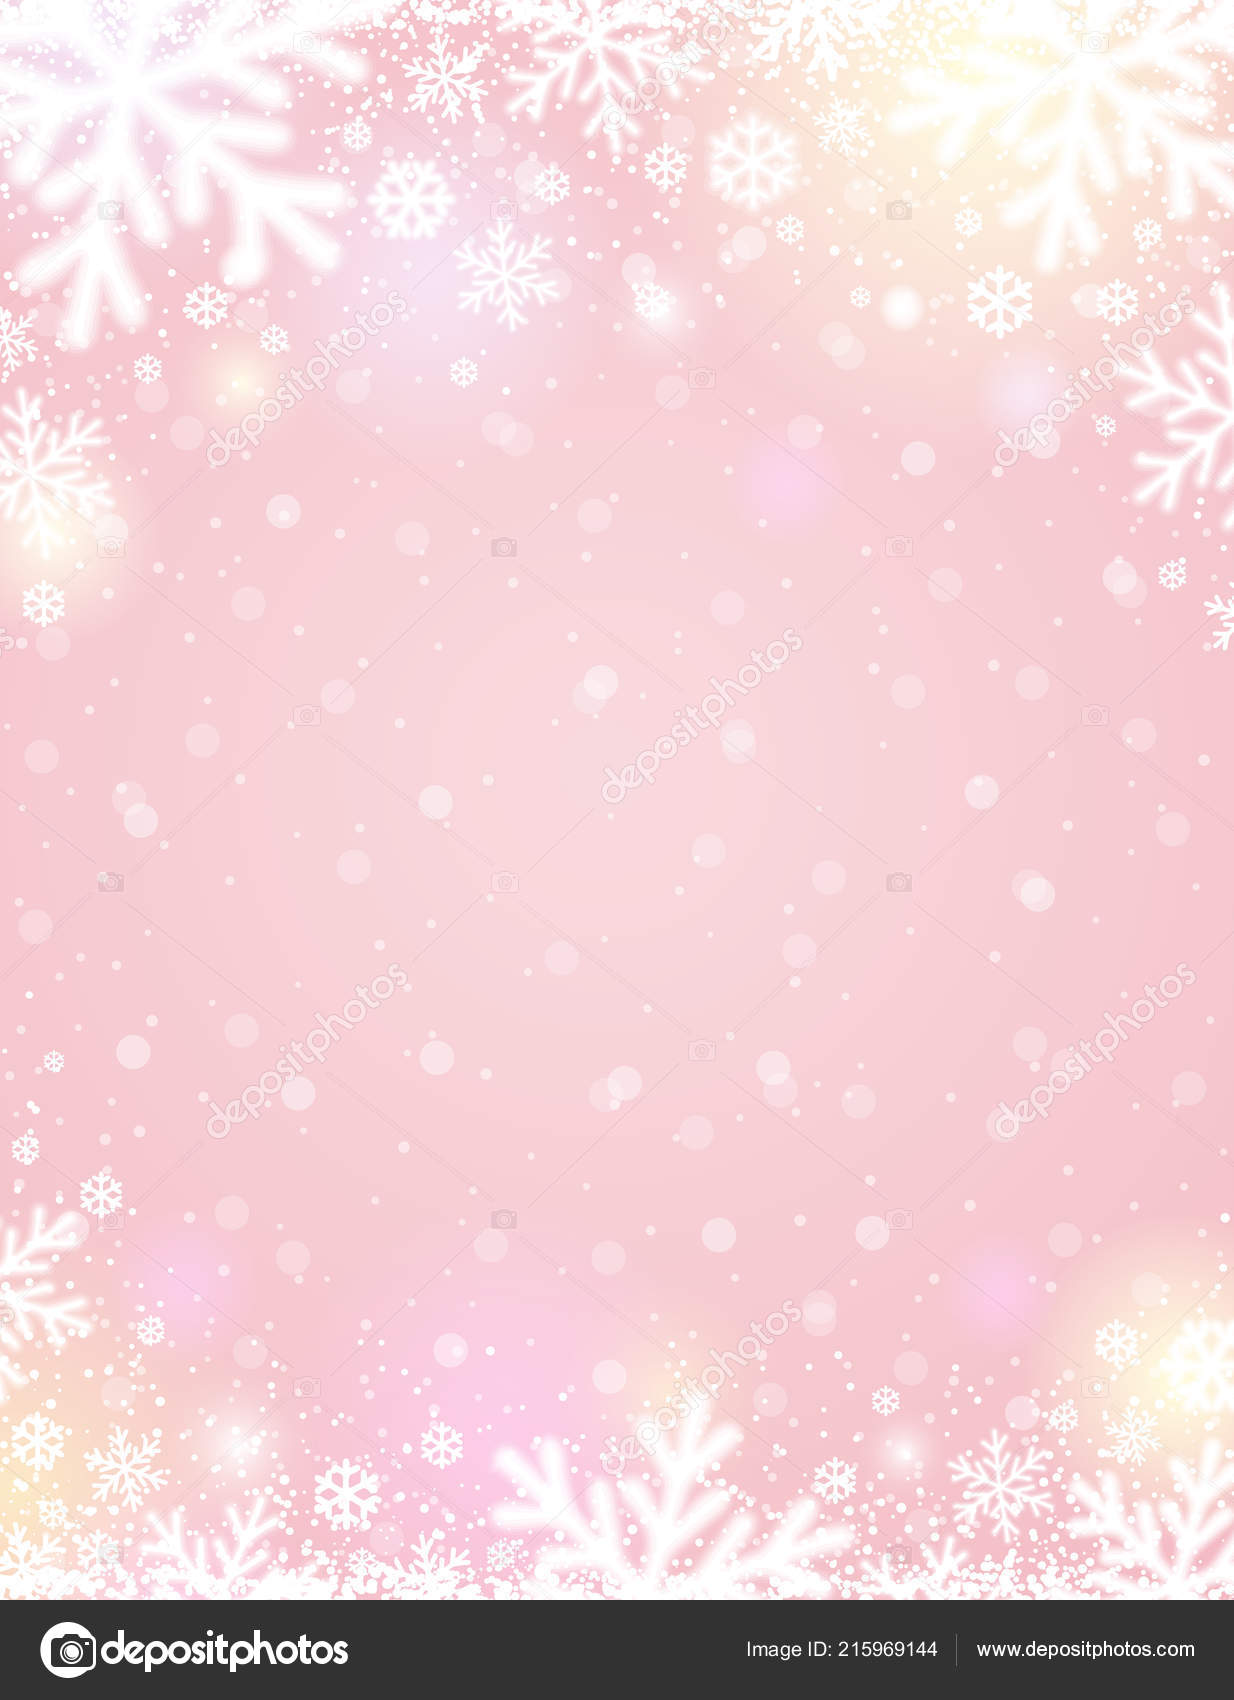 depositphotos 215969144 stock illustration pink christmas background white blurred